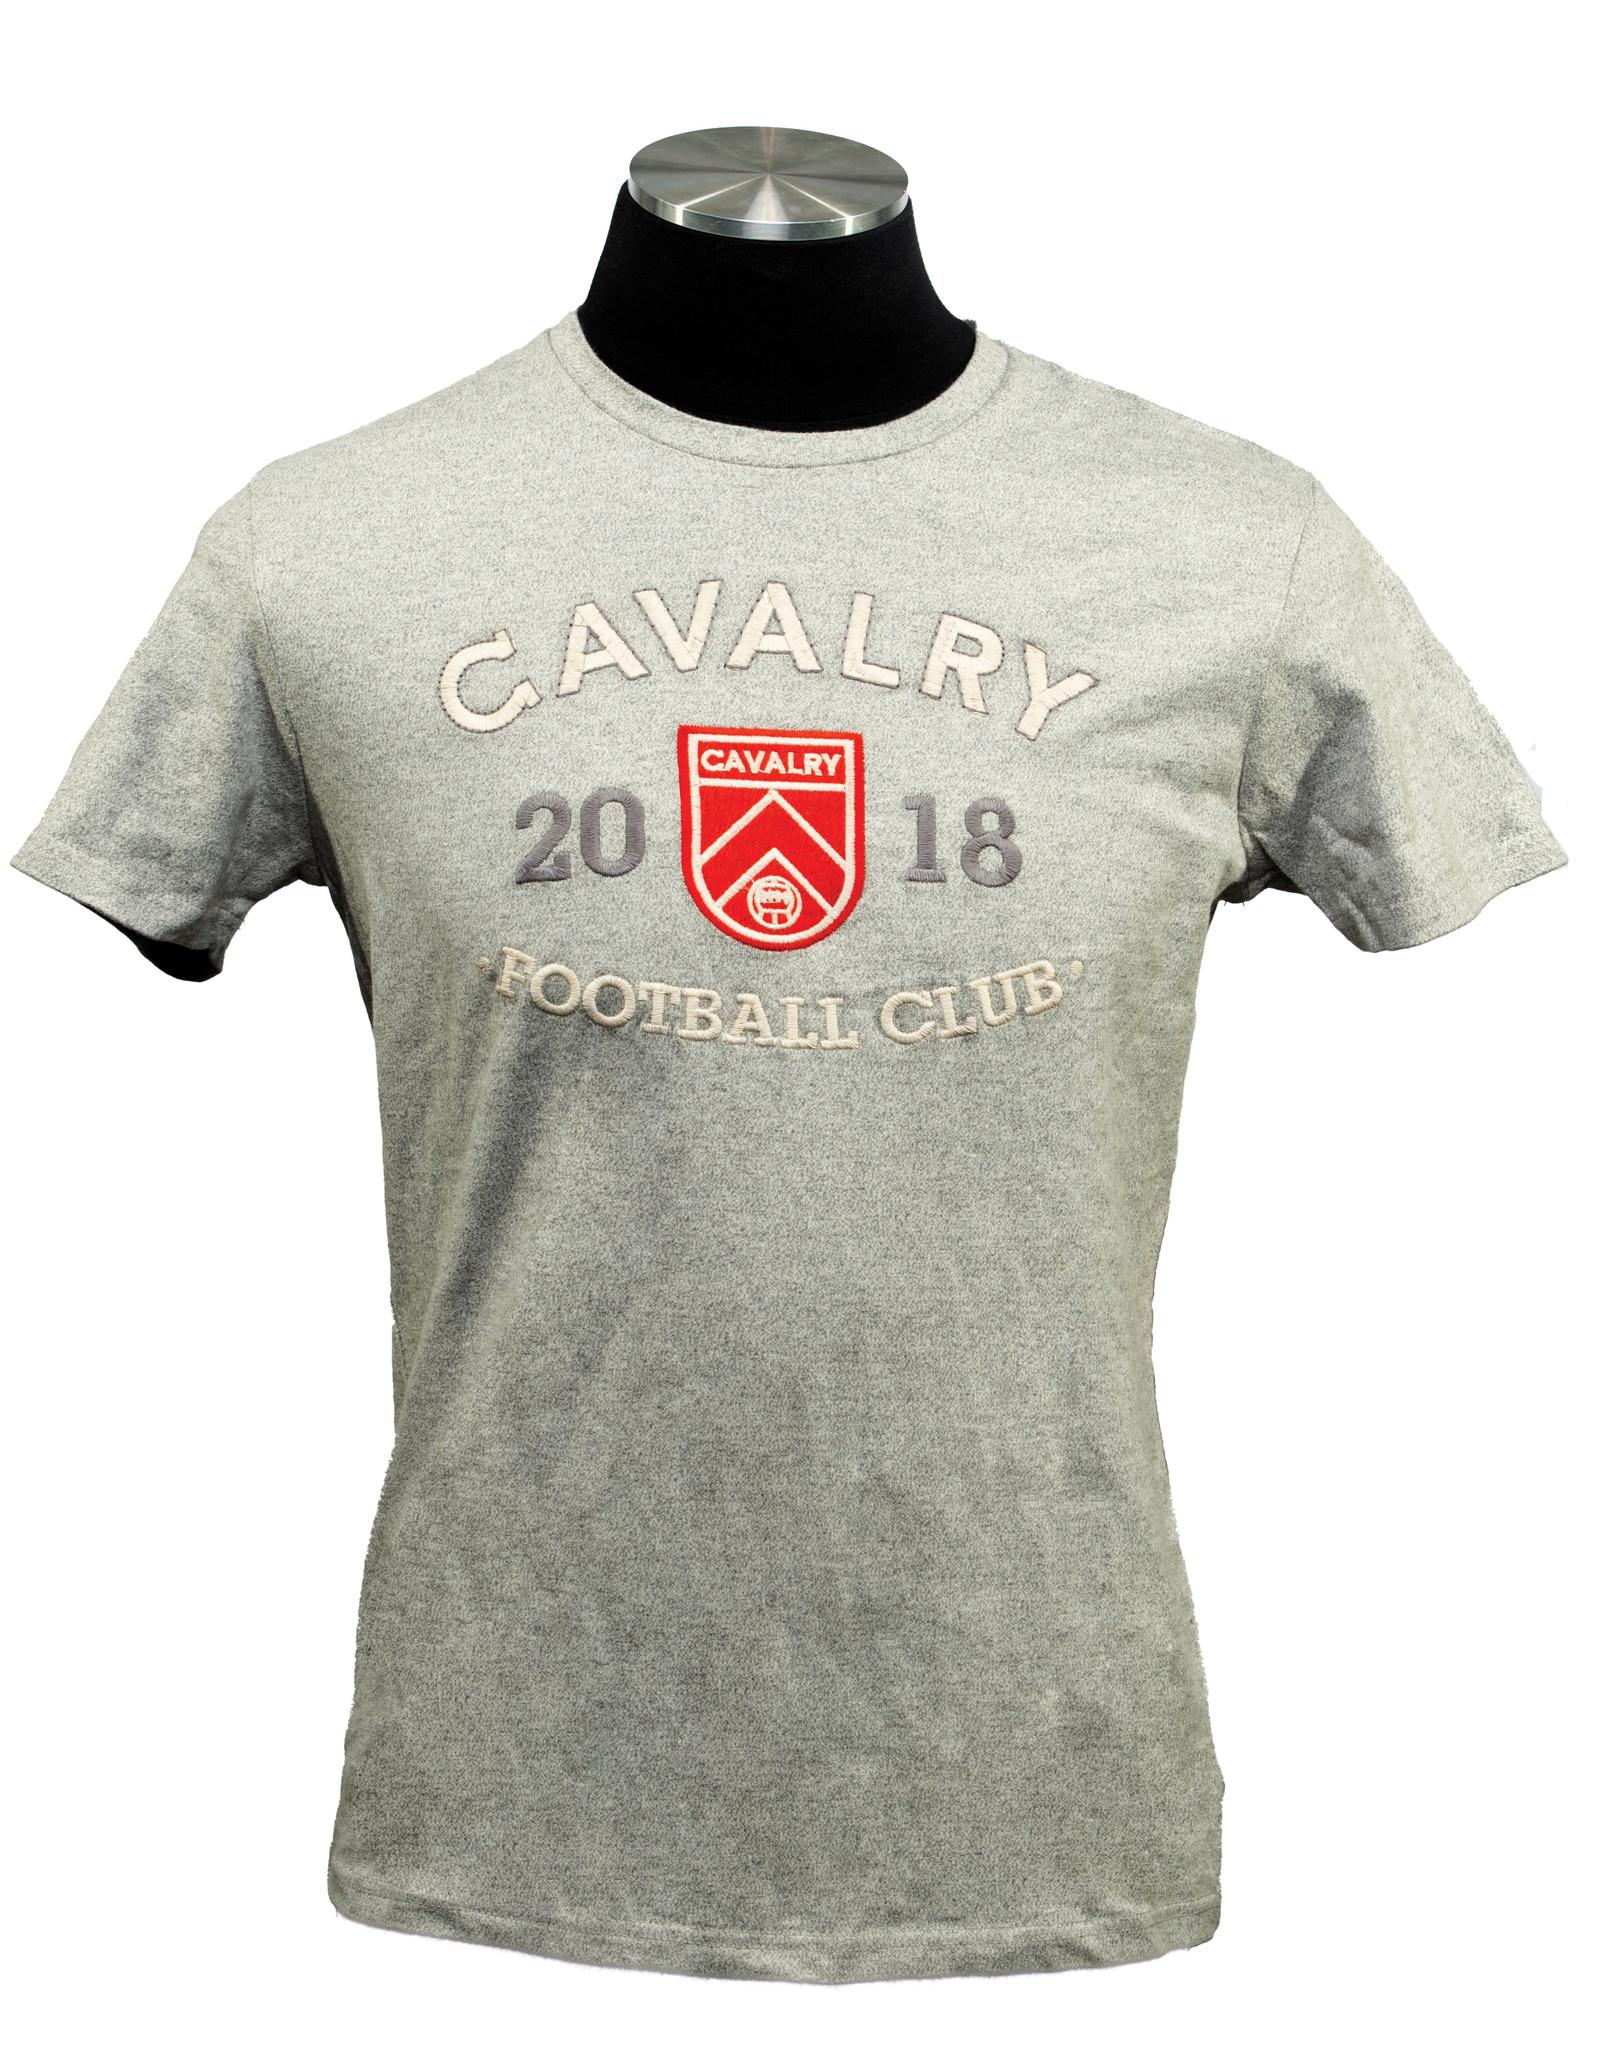 Campus Crew Cavalry FC Men's Heritage Tee